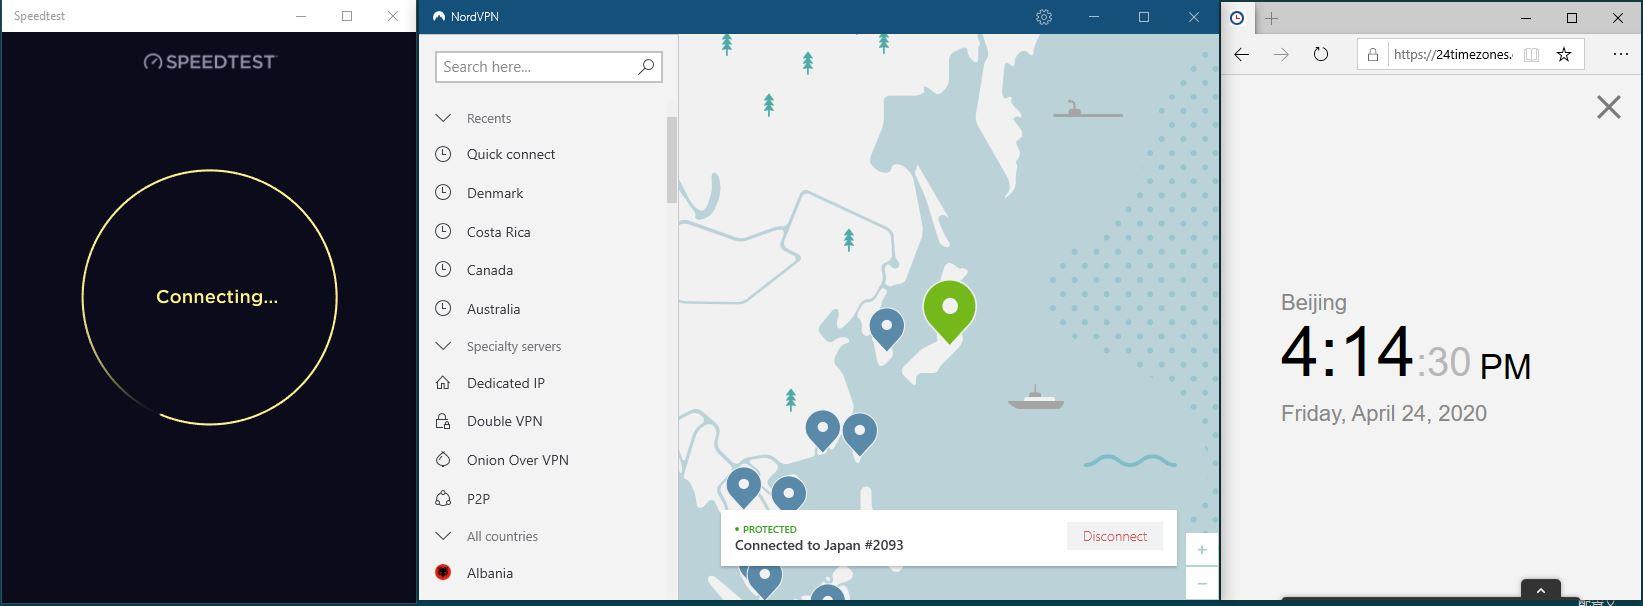 Windows10 NordVPN Japan #2093 中国VPN 翻墙 科学上网 SpeedTest测速-20200424